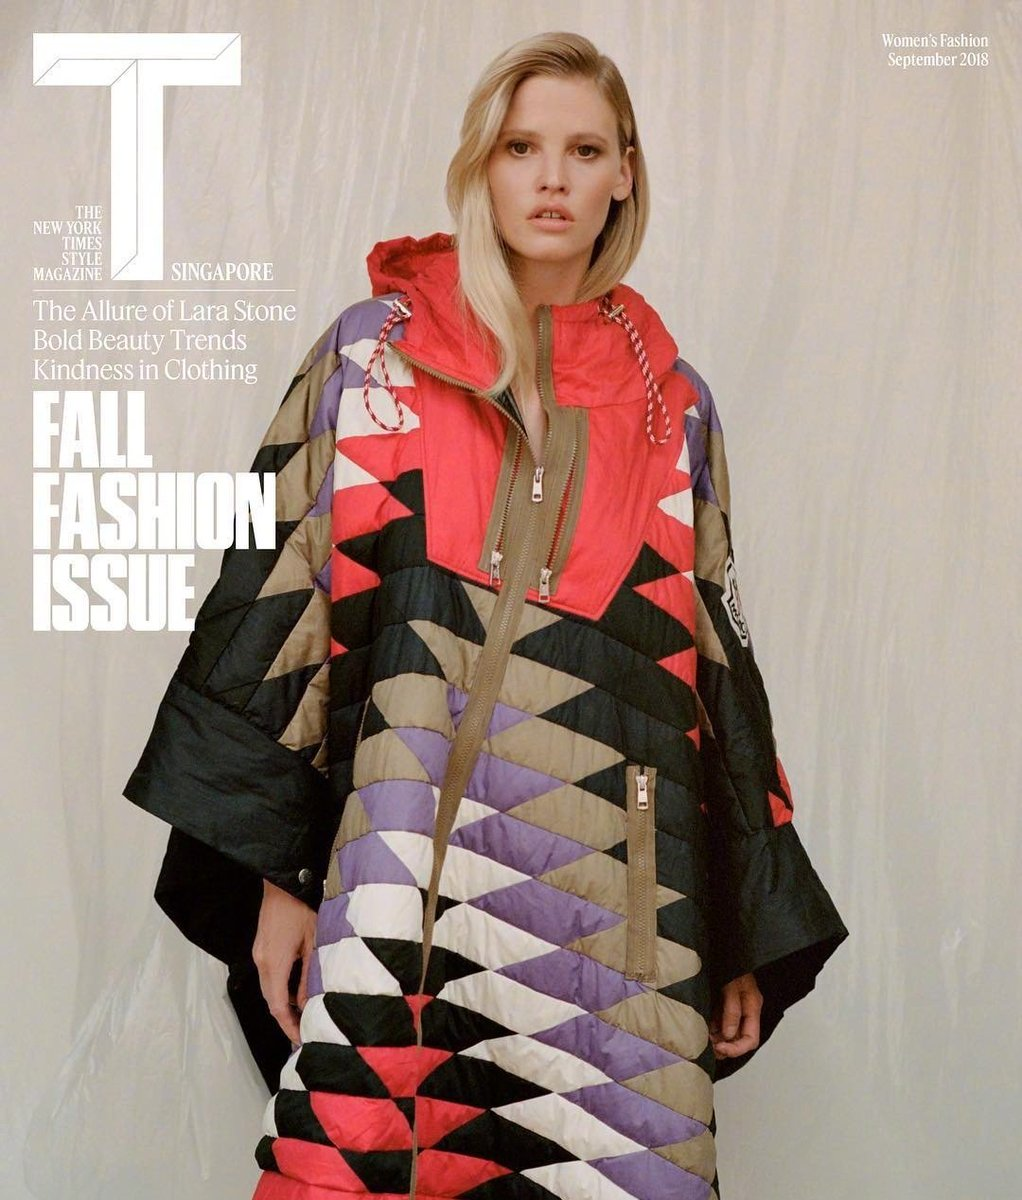 Lara Stone, The New York Times Style Magazine